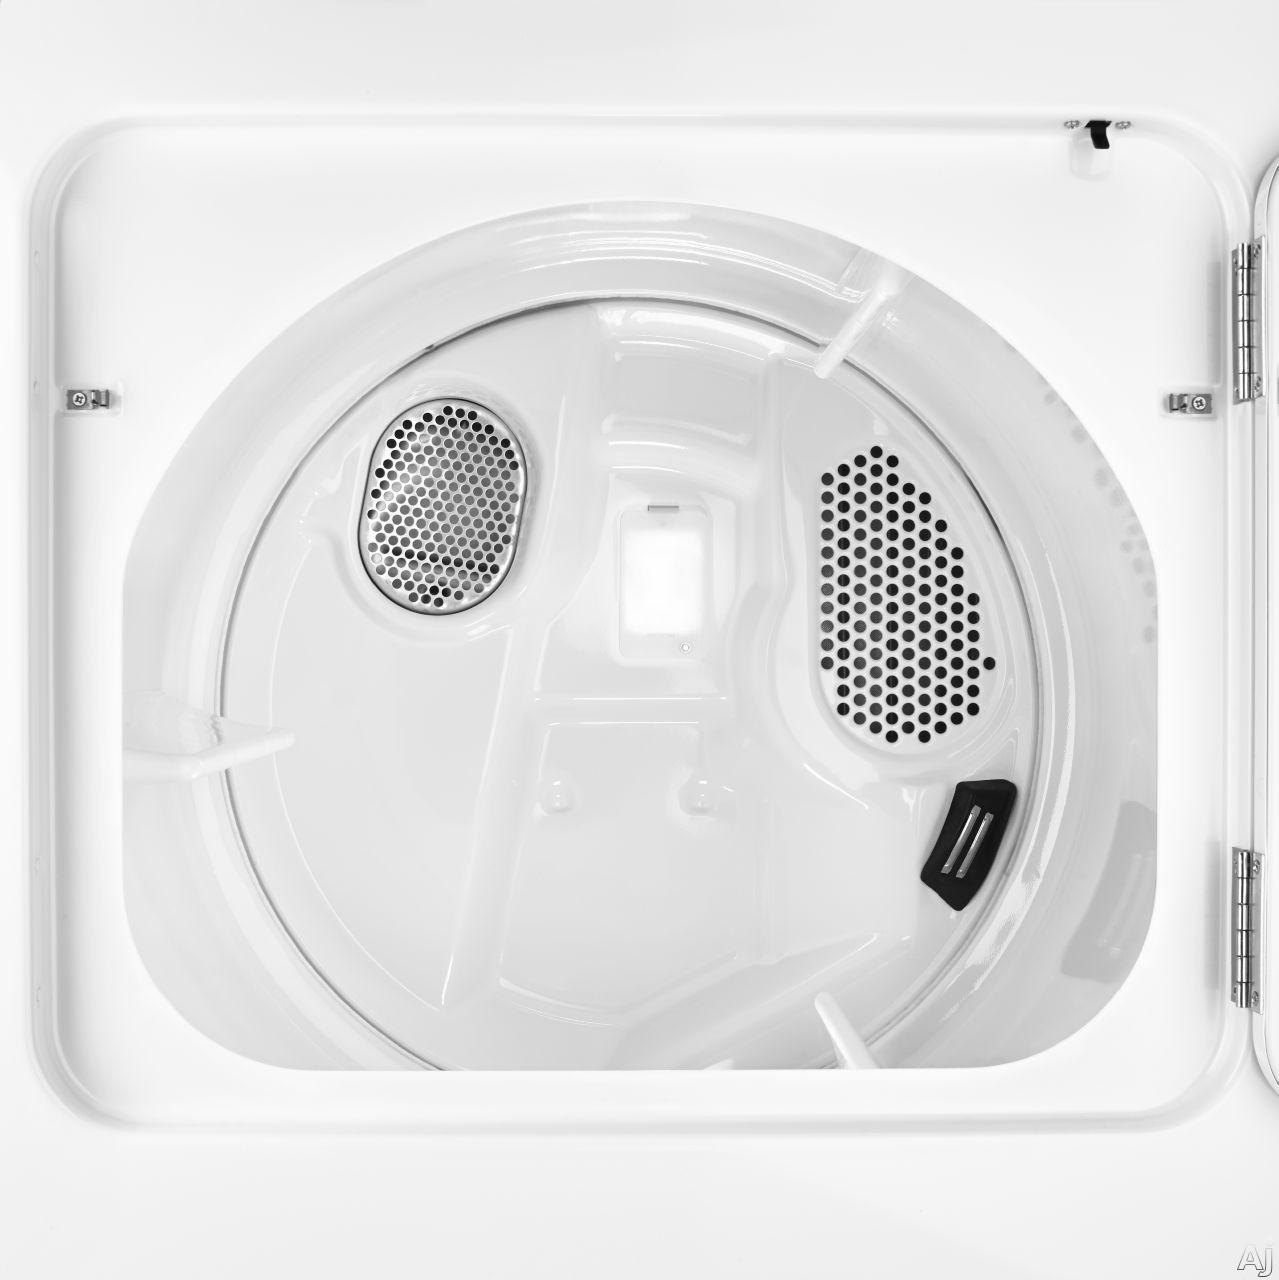 Maytag Mgdc300bw 29 Inch Gas Dryer With 7 0 Cu Ft